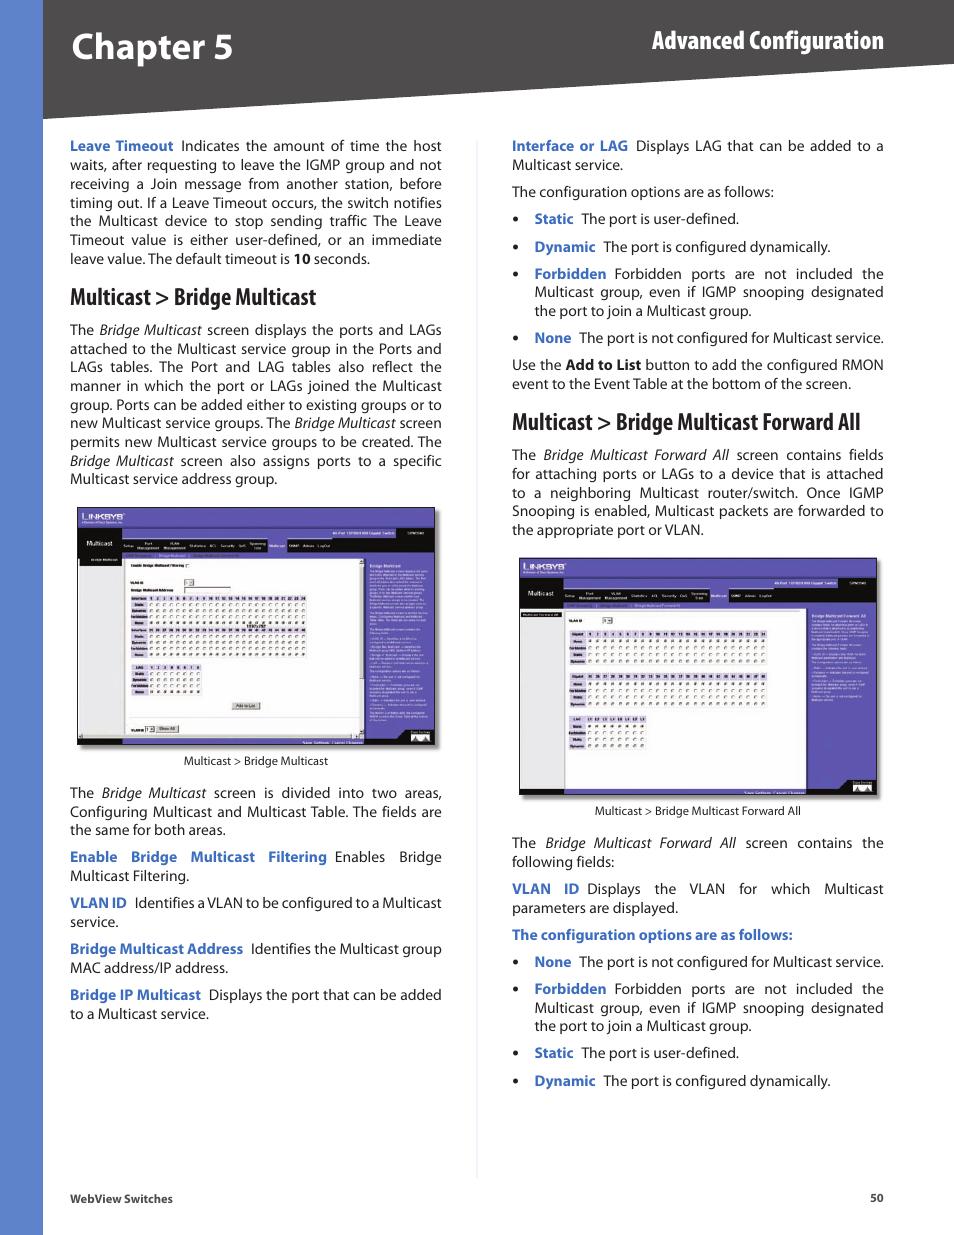 Multicast > bridge multicast, Multicast > bridge multicast